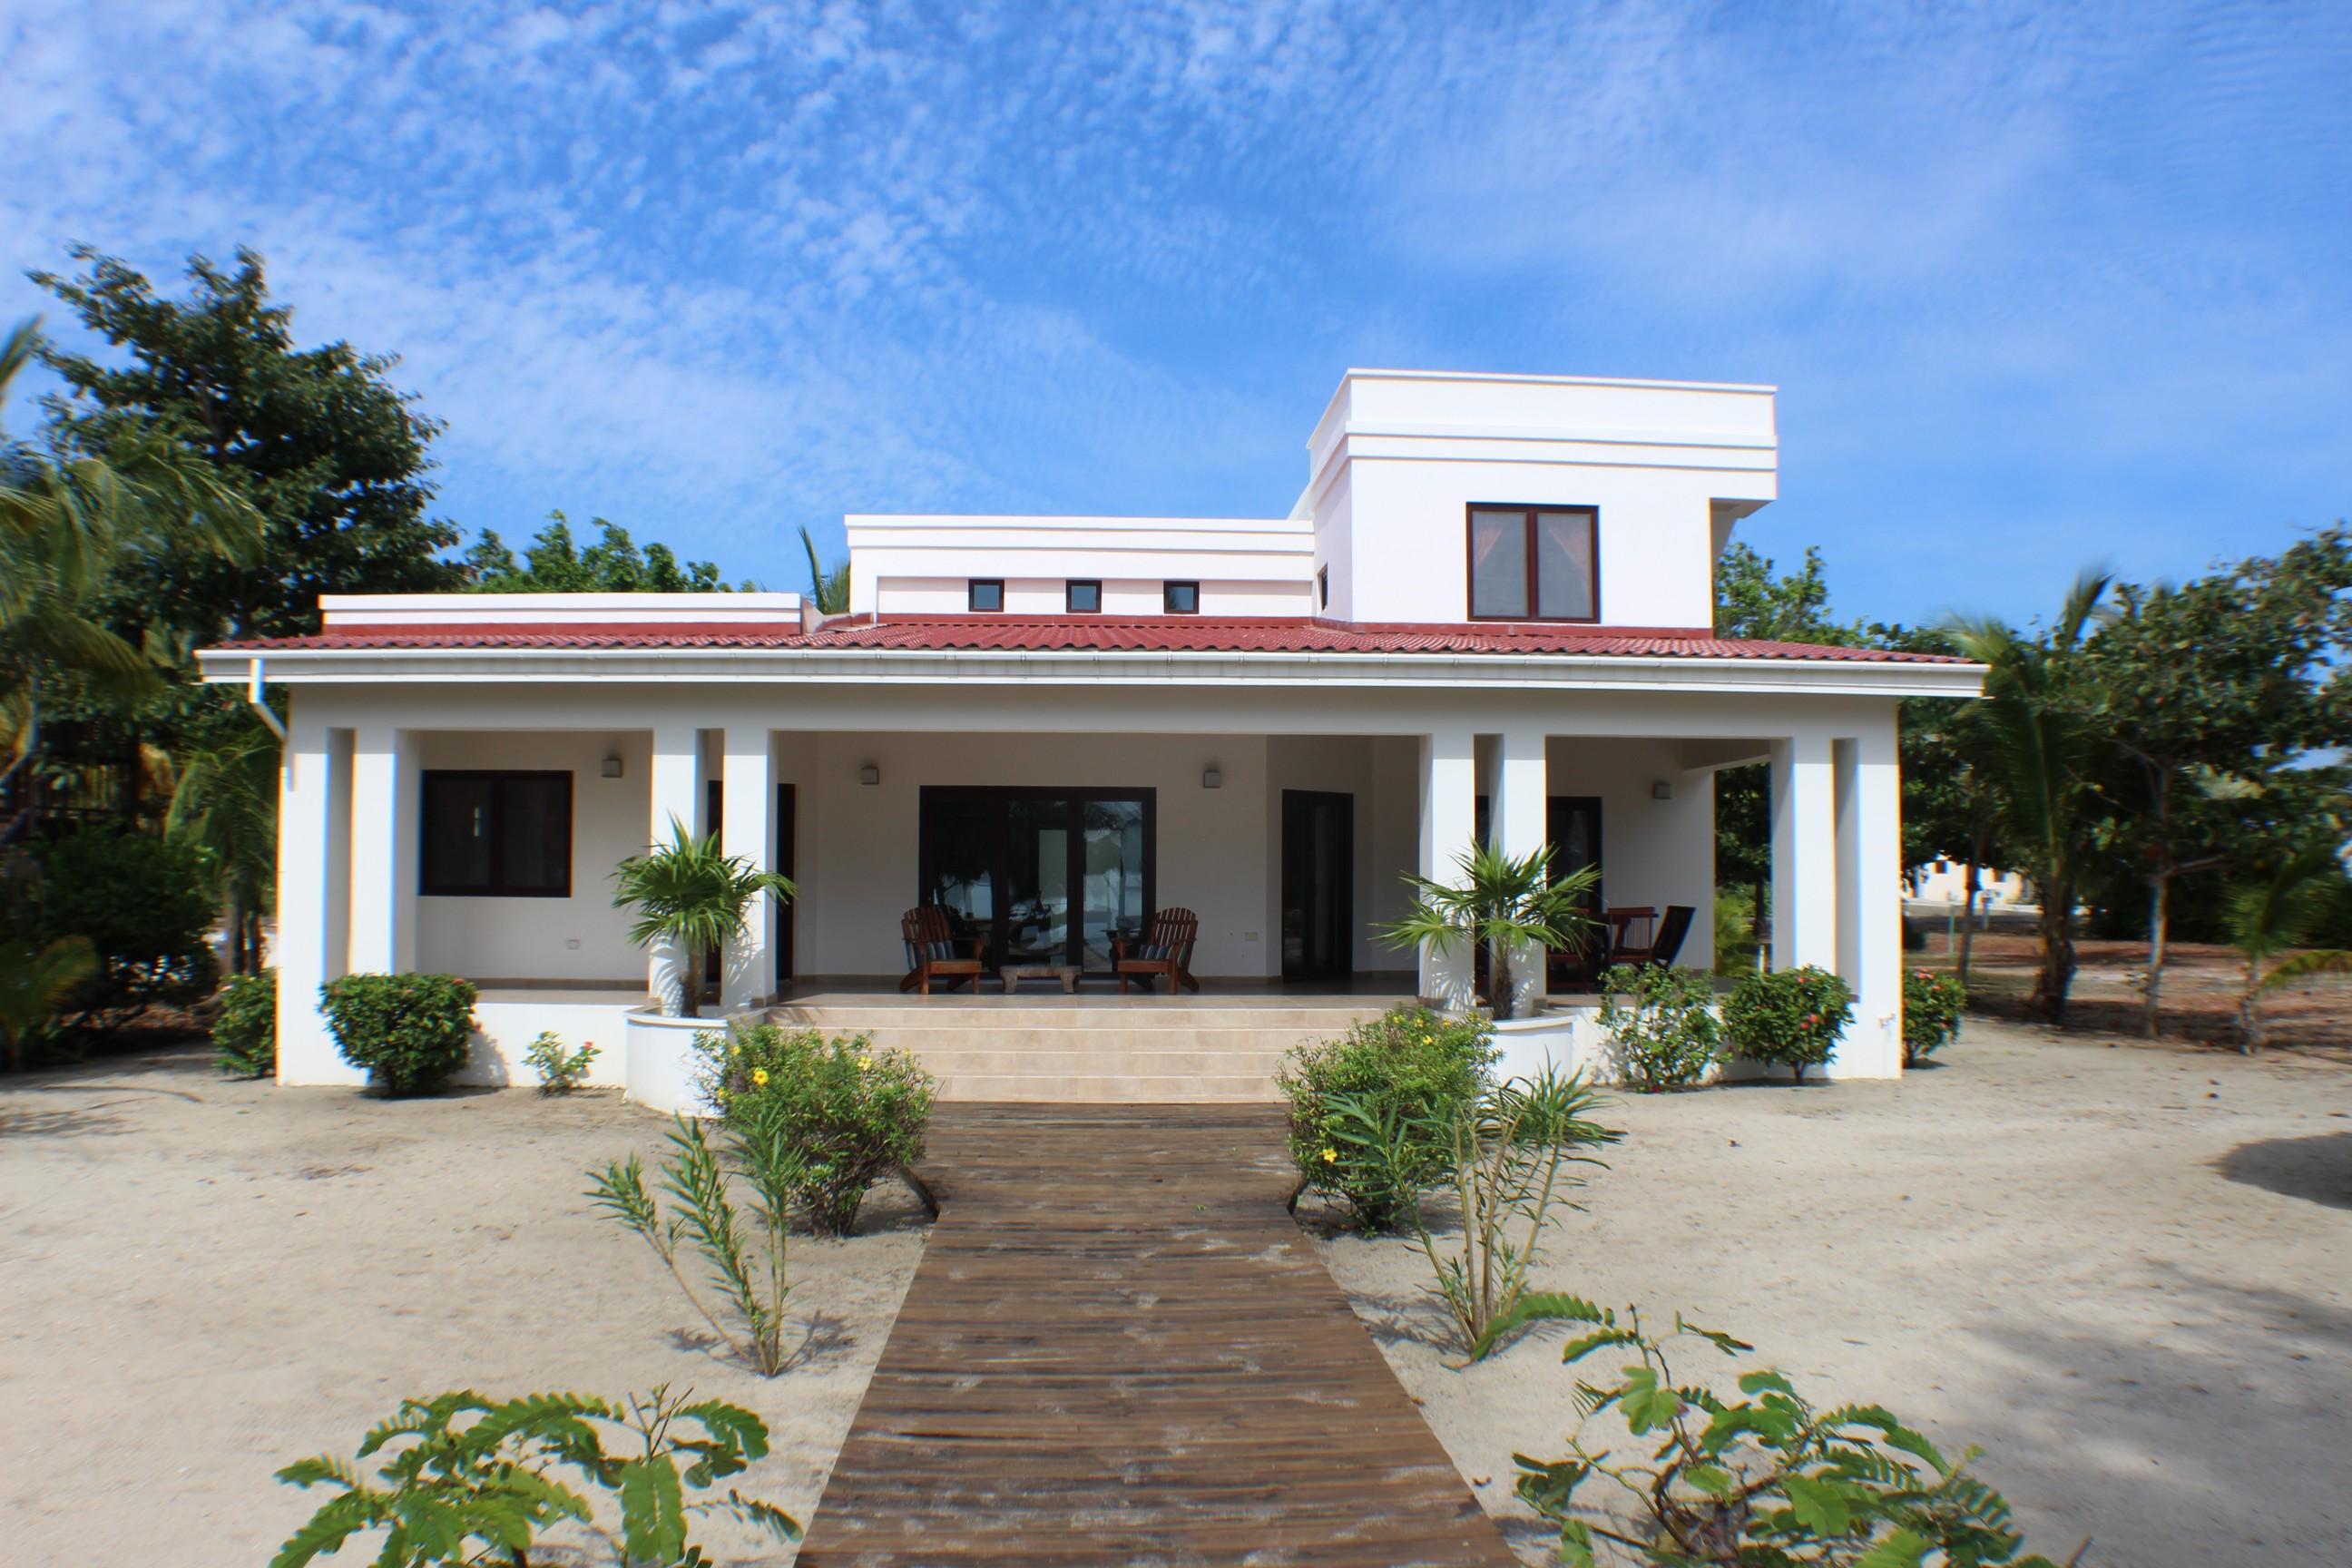 Casa para uma família para Venda às Maison Blanche Other Stann Creek, Stann Creek, Belize